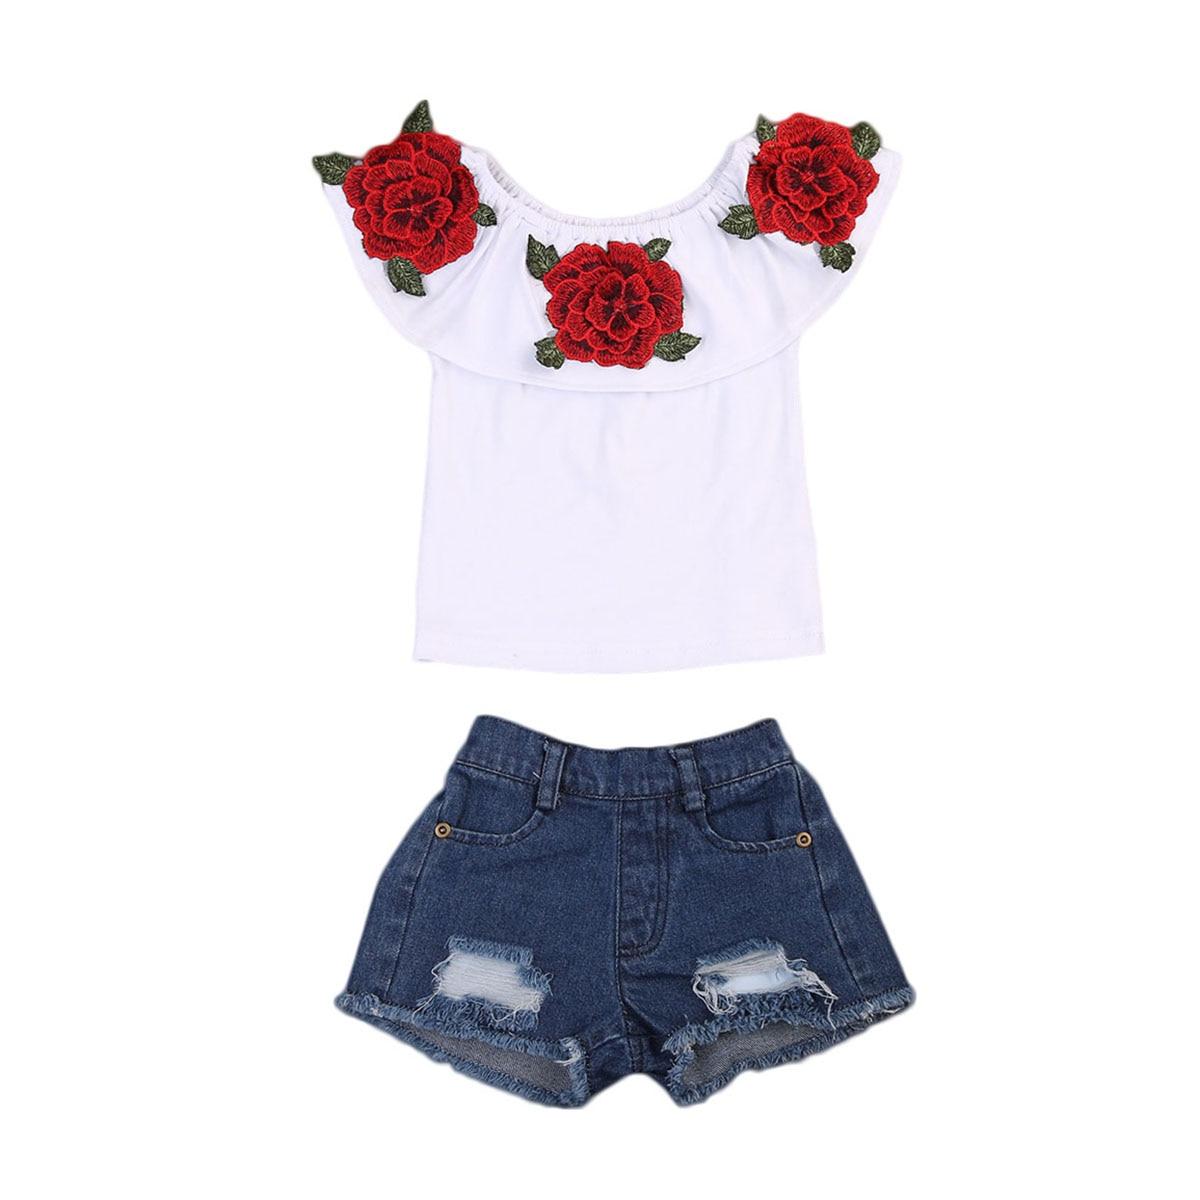 Buy flower tops t shirts denim hot shorts for Buy denim shirts online